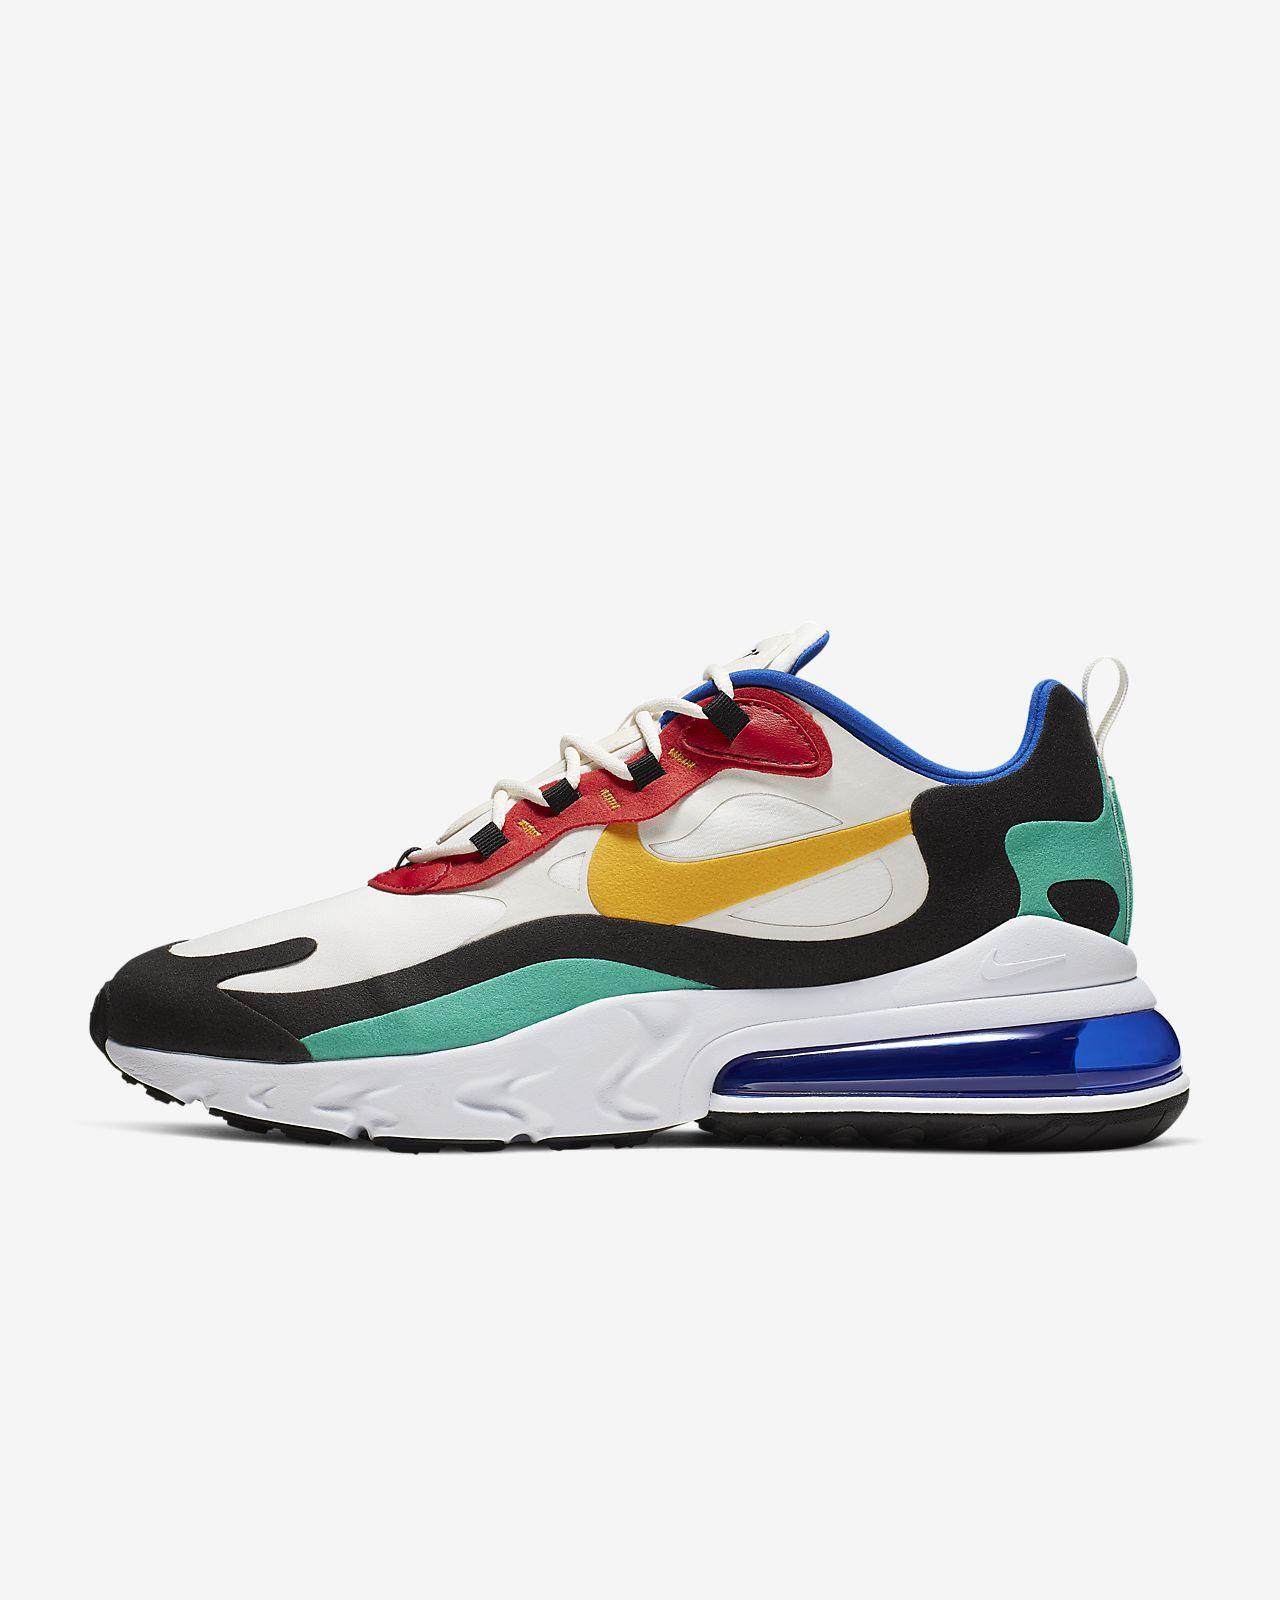 Nike Air Max 270 React Bauhaus-sko til mænd